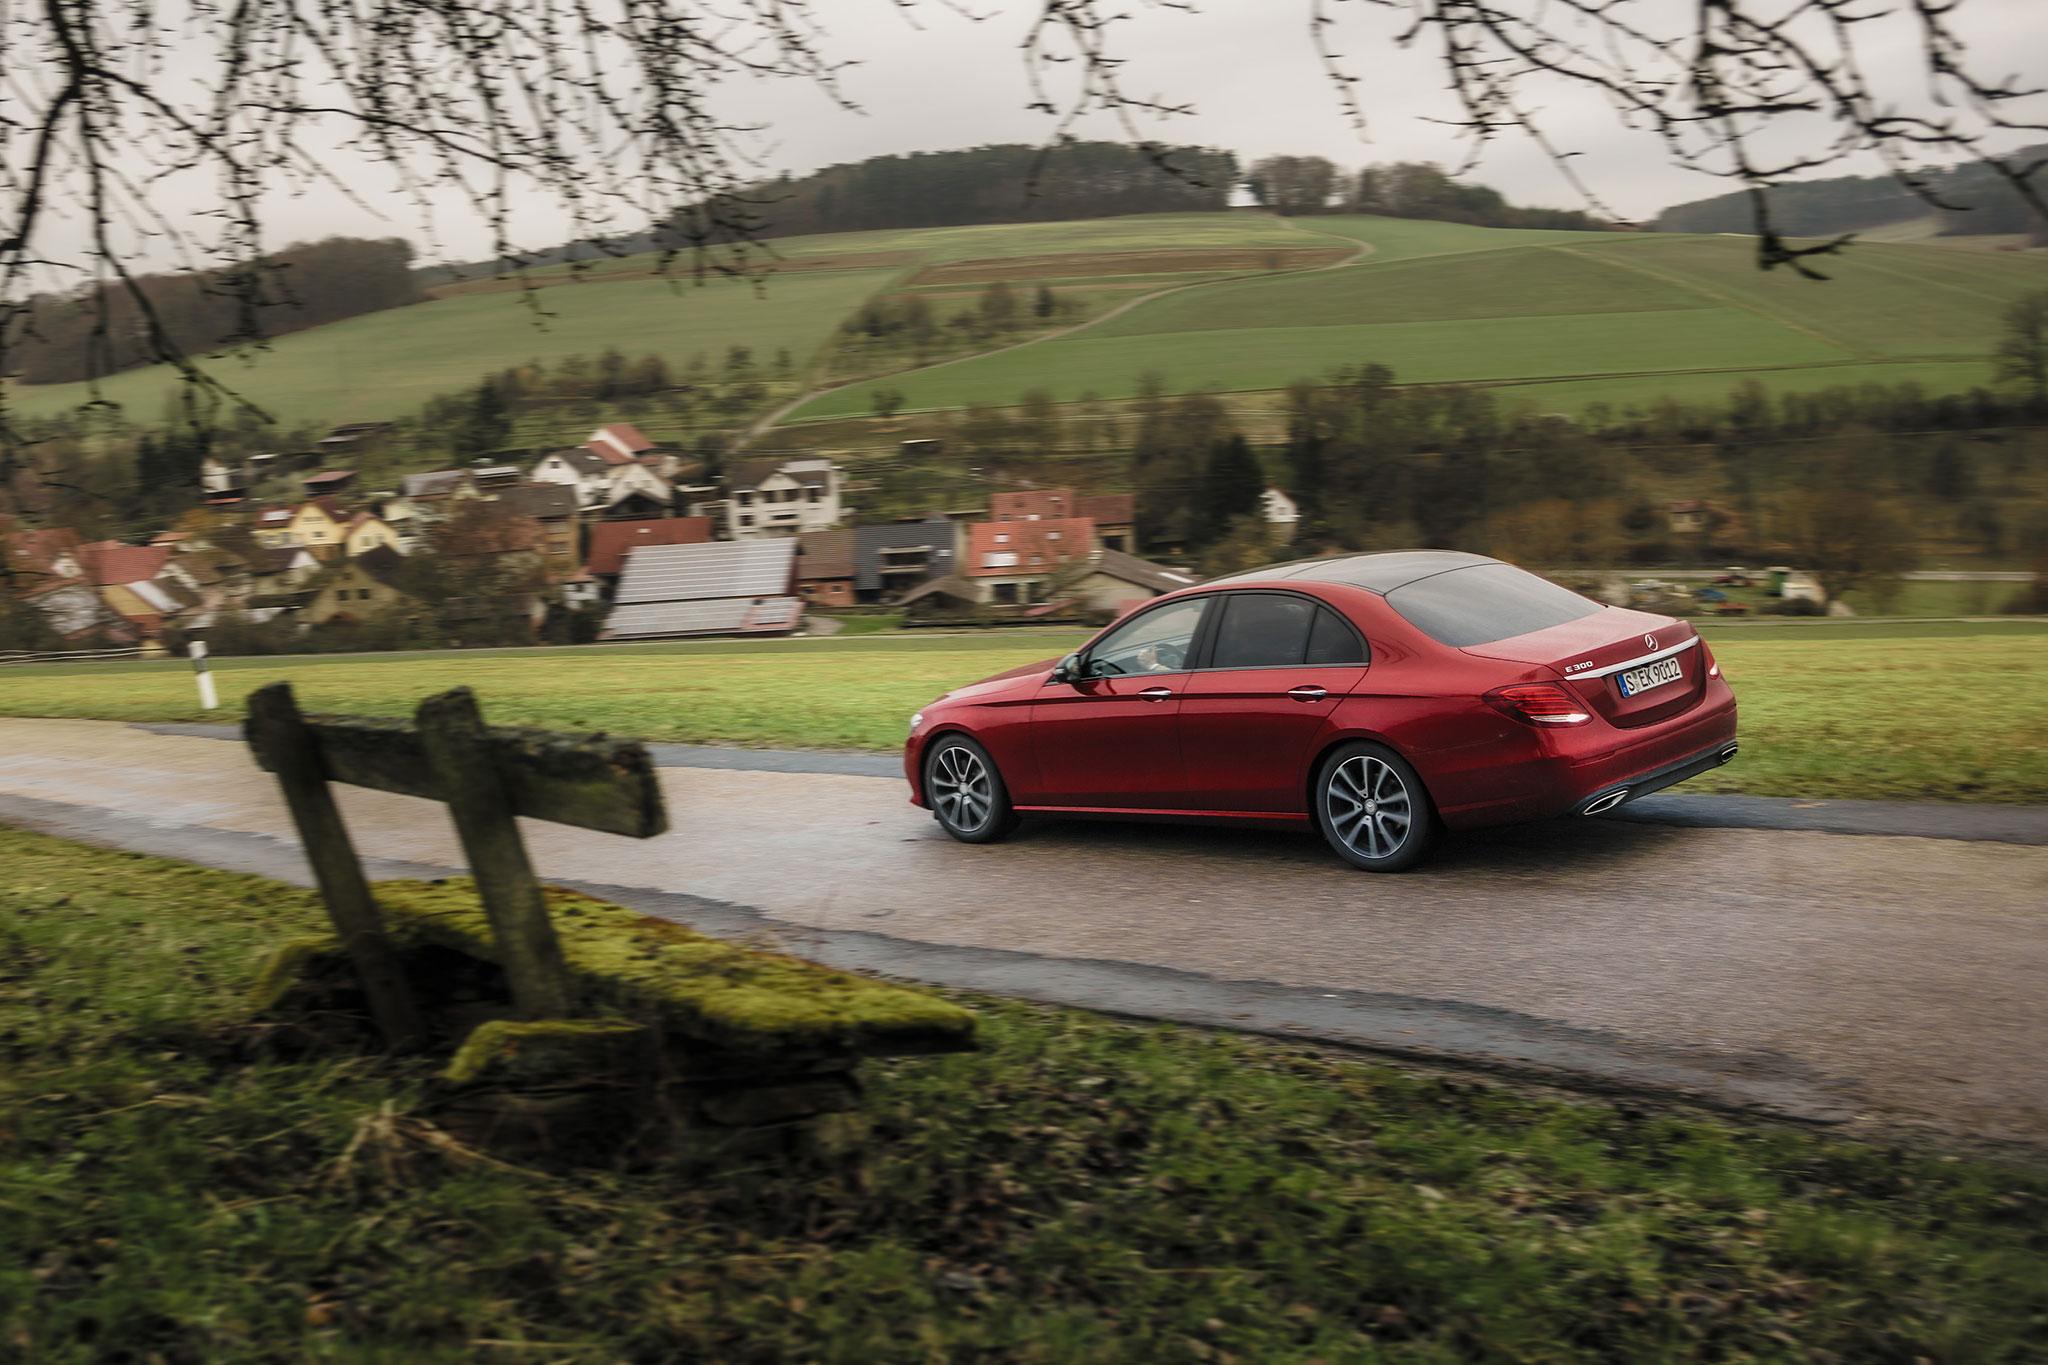 2017 mercedes benz mbrace 2017 2018 best cars reviews for Mbrace mercedes benz